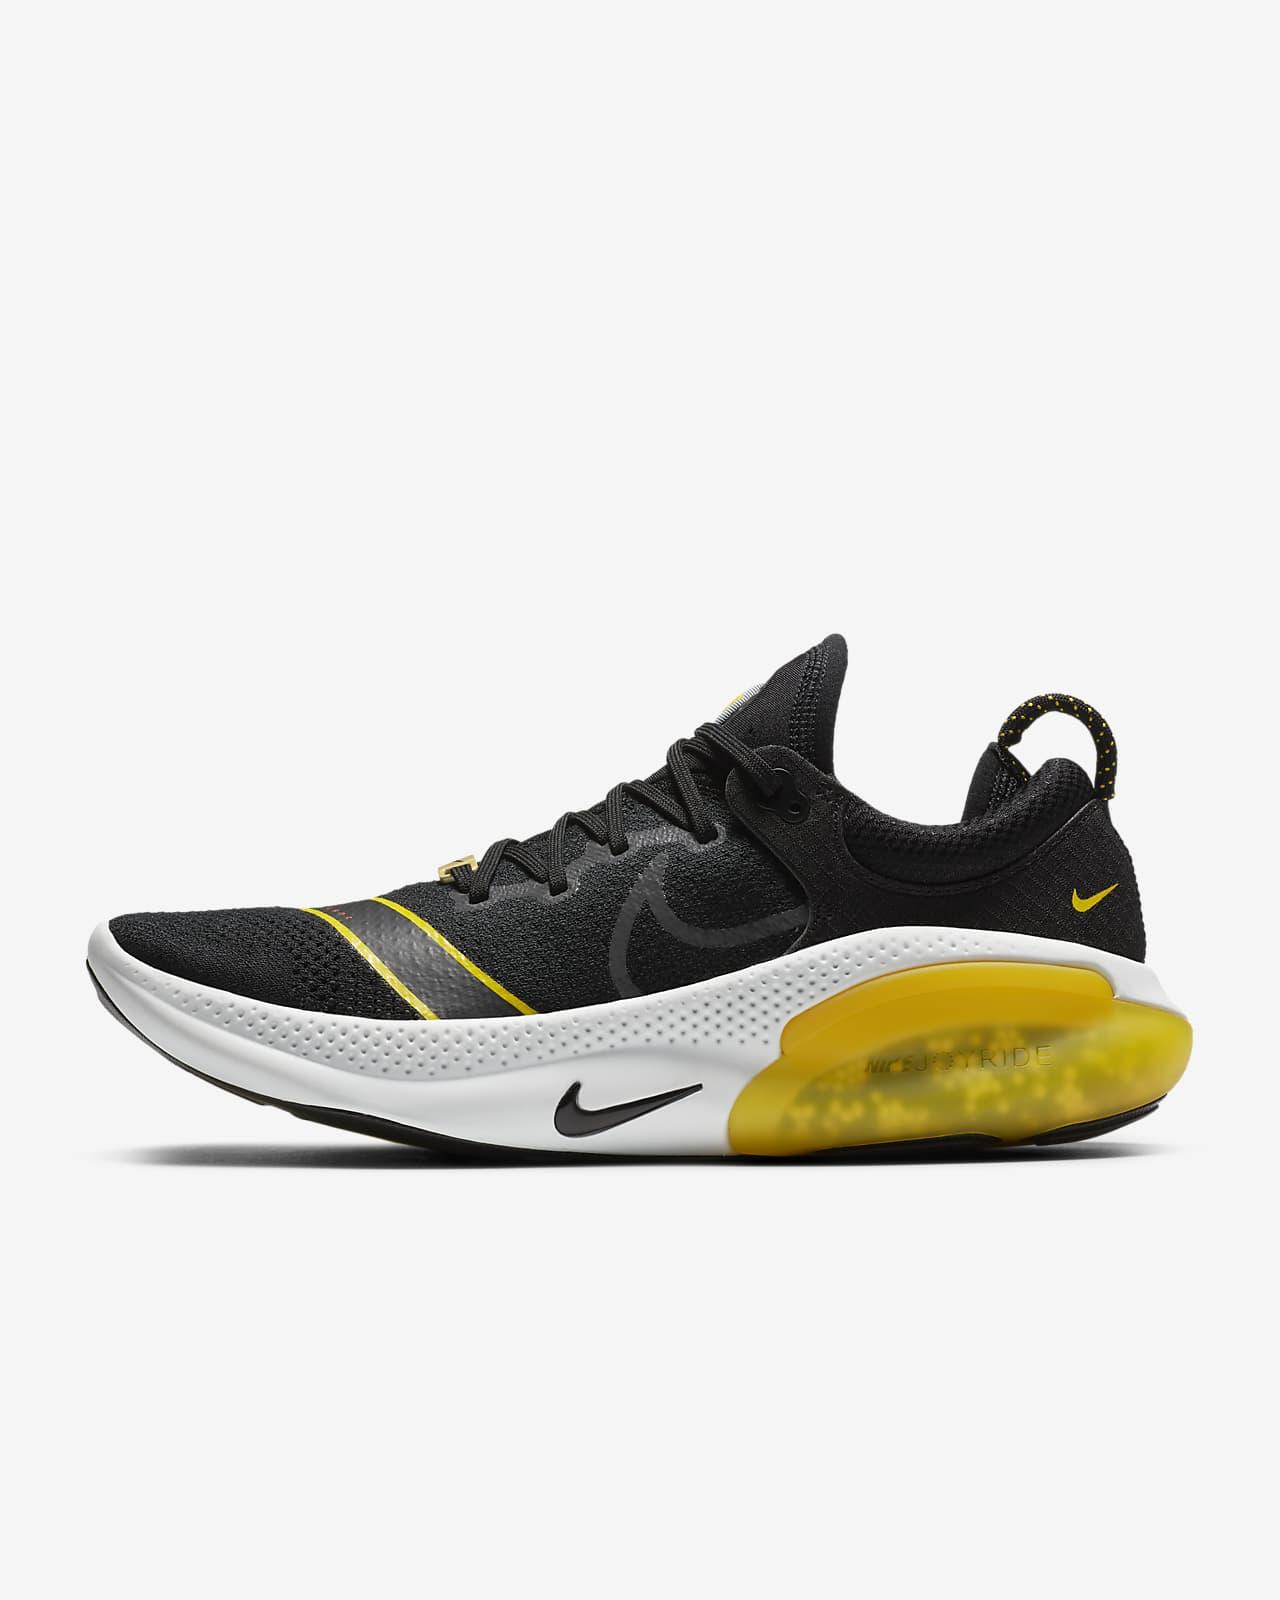 "Nike Joyride Run Flyknit ""Fast City"" Herren-Laufschuh"